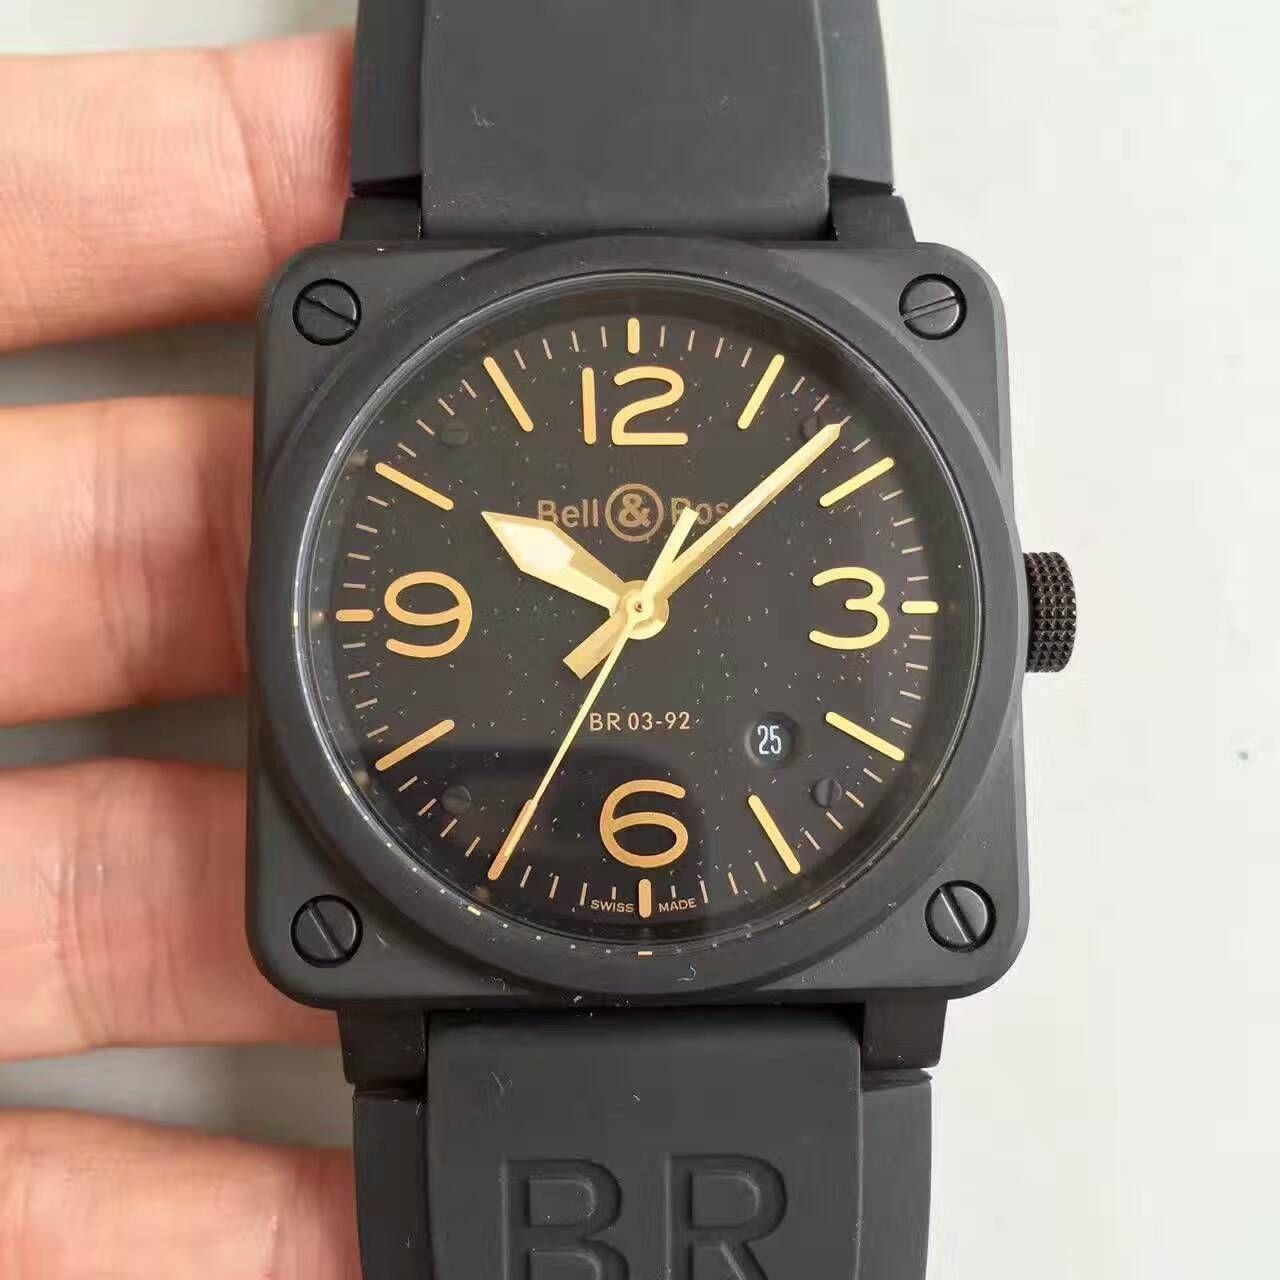 【BR厂超A1:1精仿手表】柏莱士AVIATION系列BR 03-92 HERITAGE腕表 / BL005